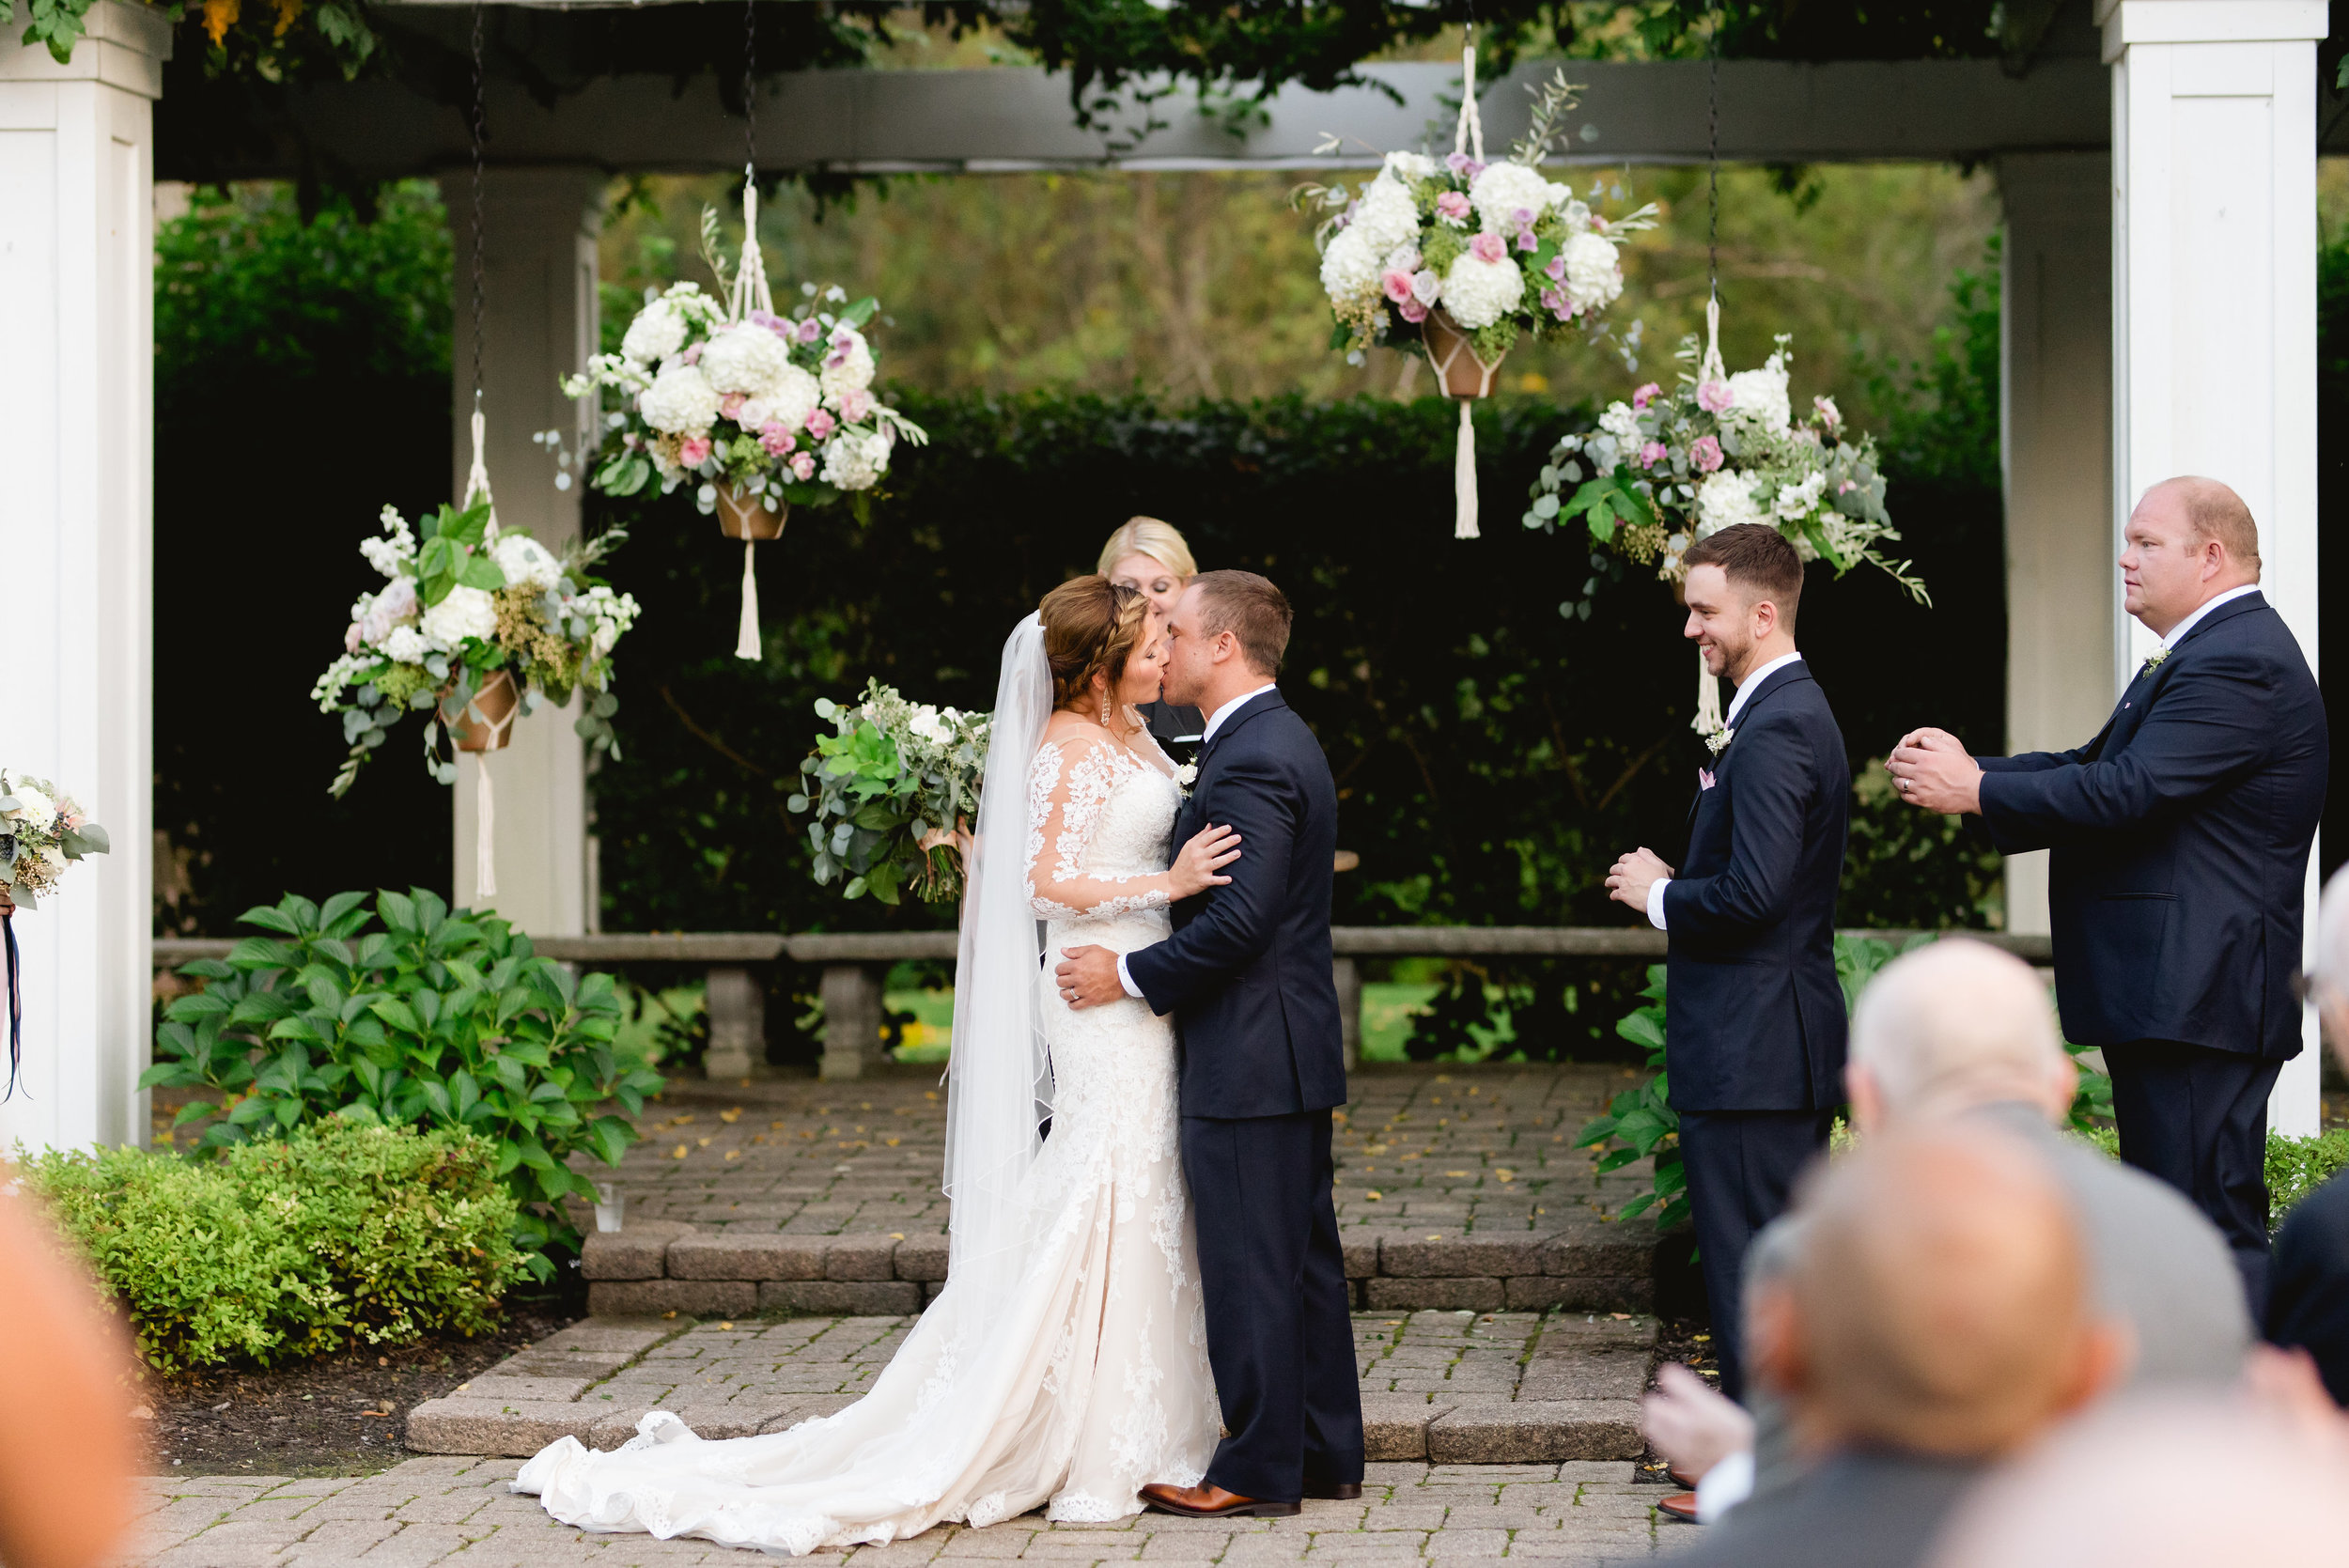 wellers wedding ceremony flowers